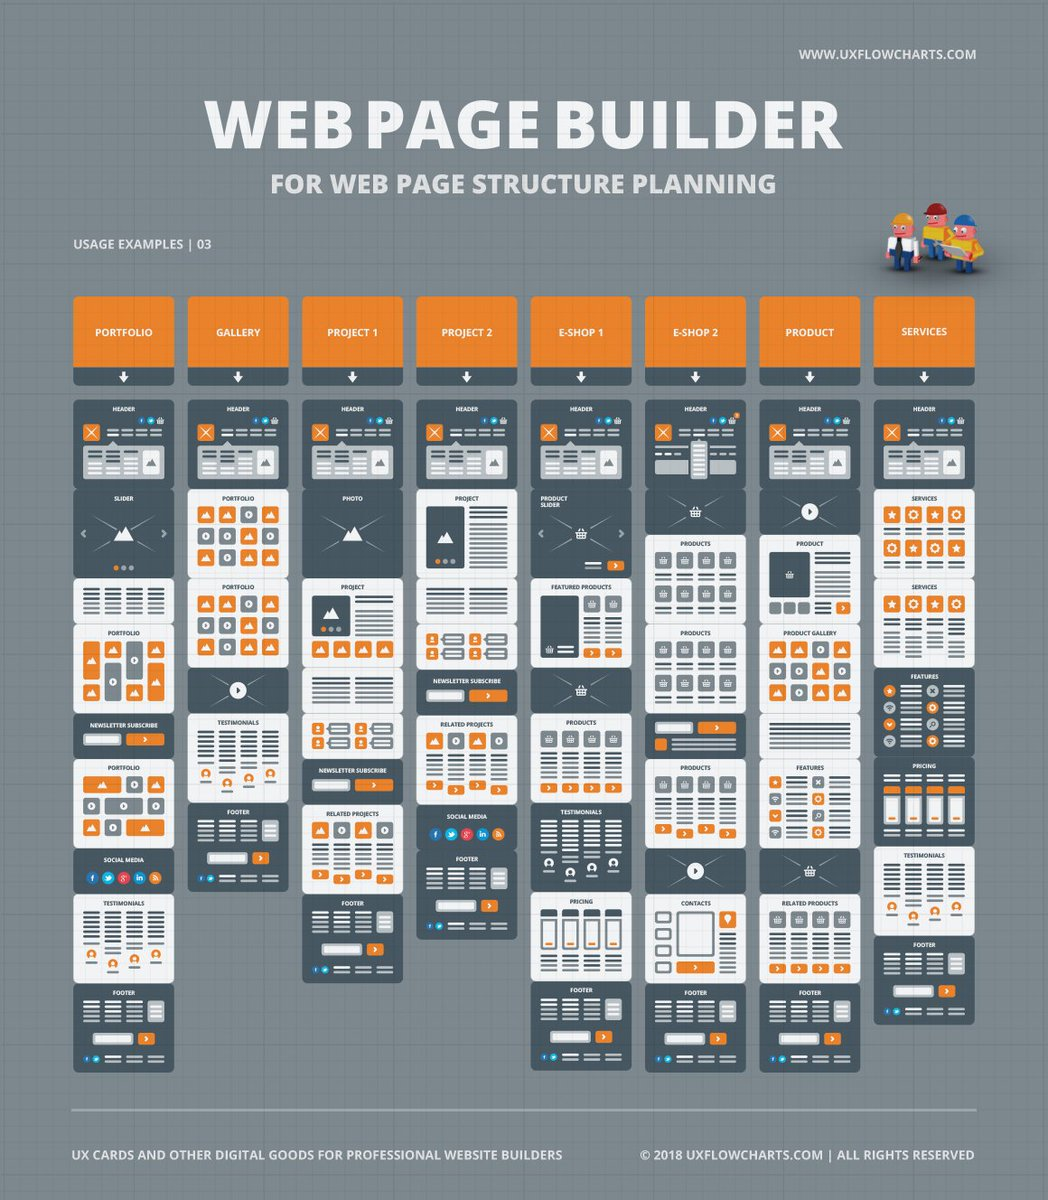 Digital Web Page Builder #ux #uxd #uxdesign #wireframes #prototyping #designthinking #design #website #ui